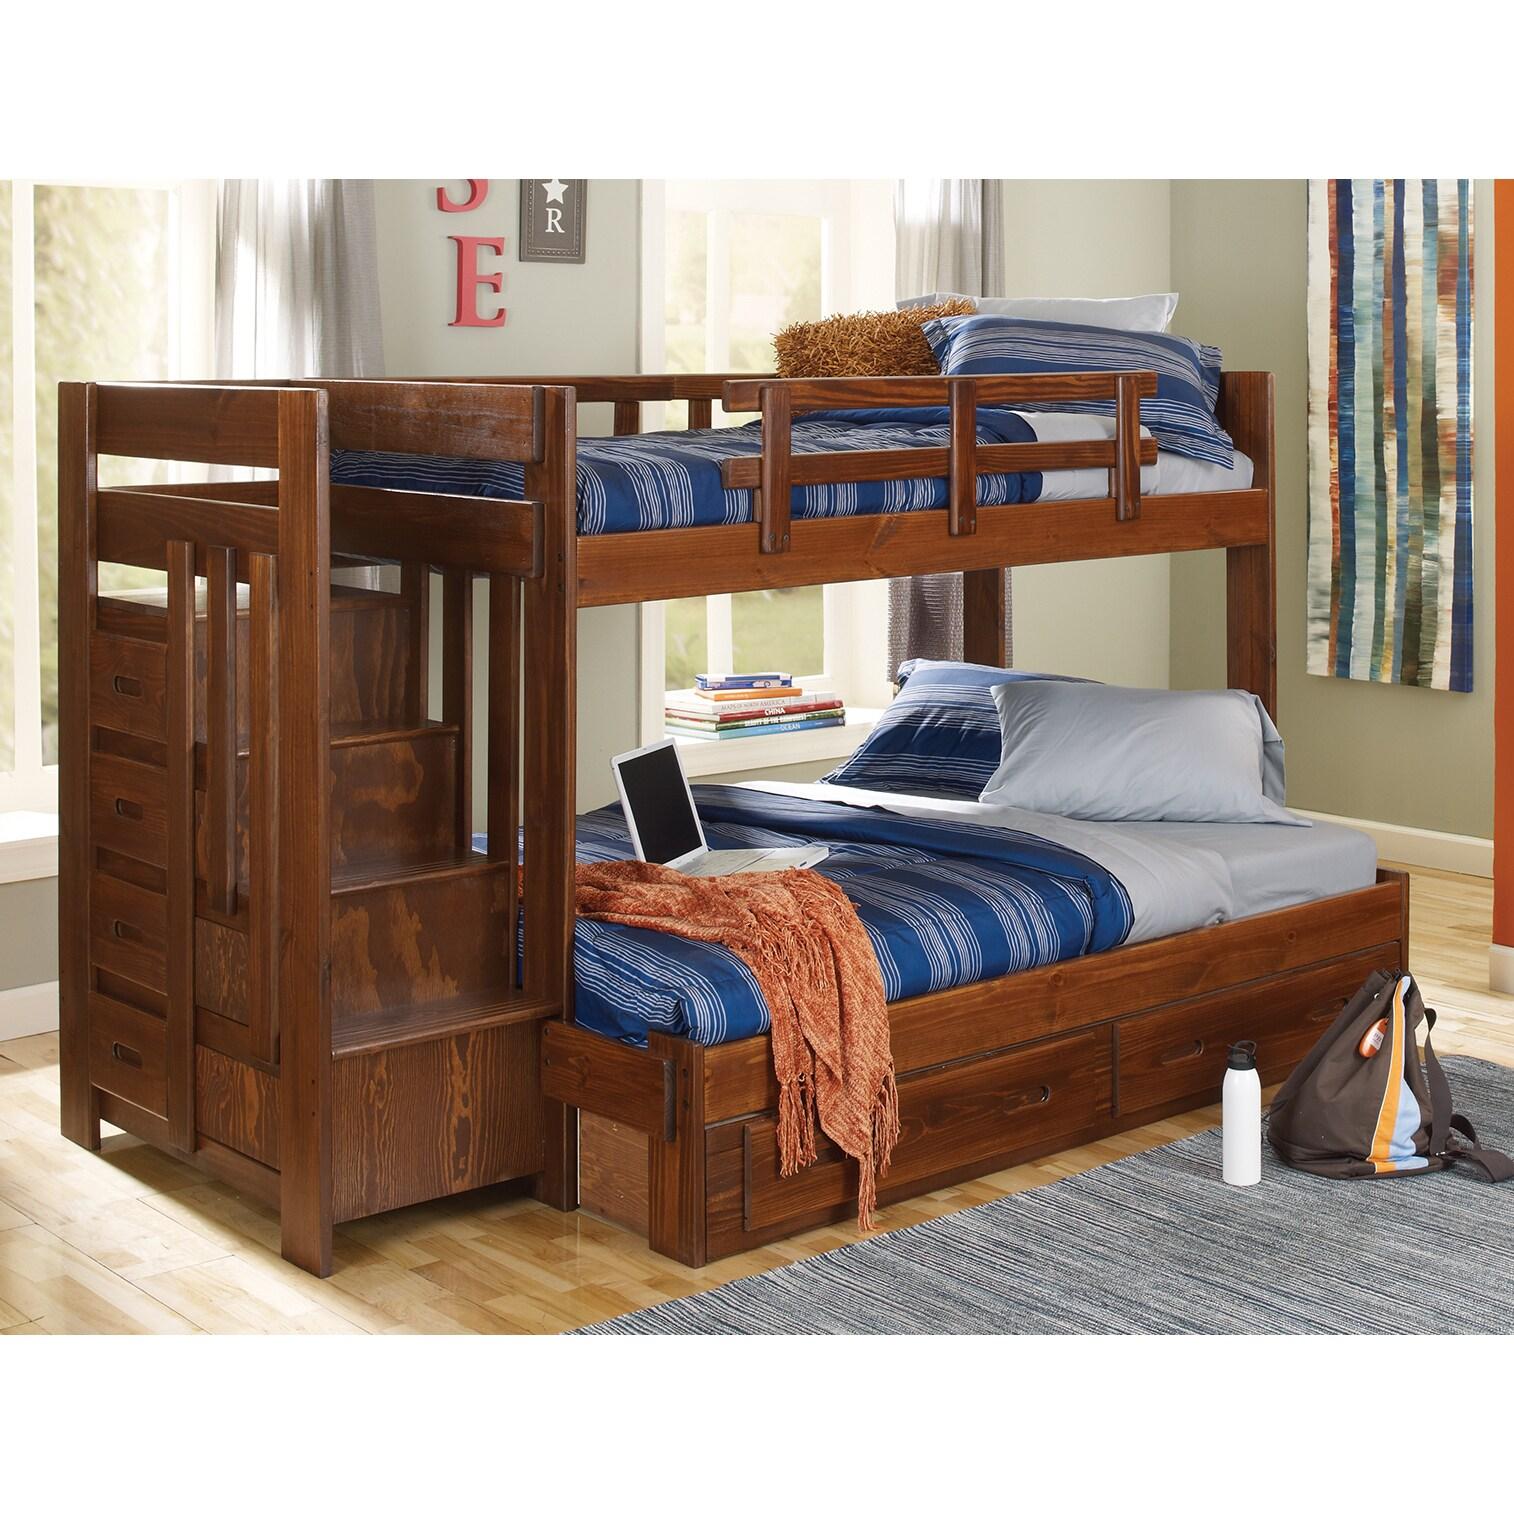 Shop Woodcrest Heartland Twin/ Full Stairway Bunk Bed - Free ...